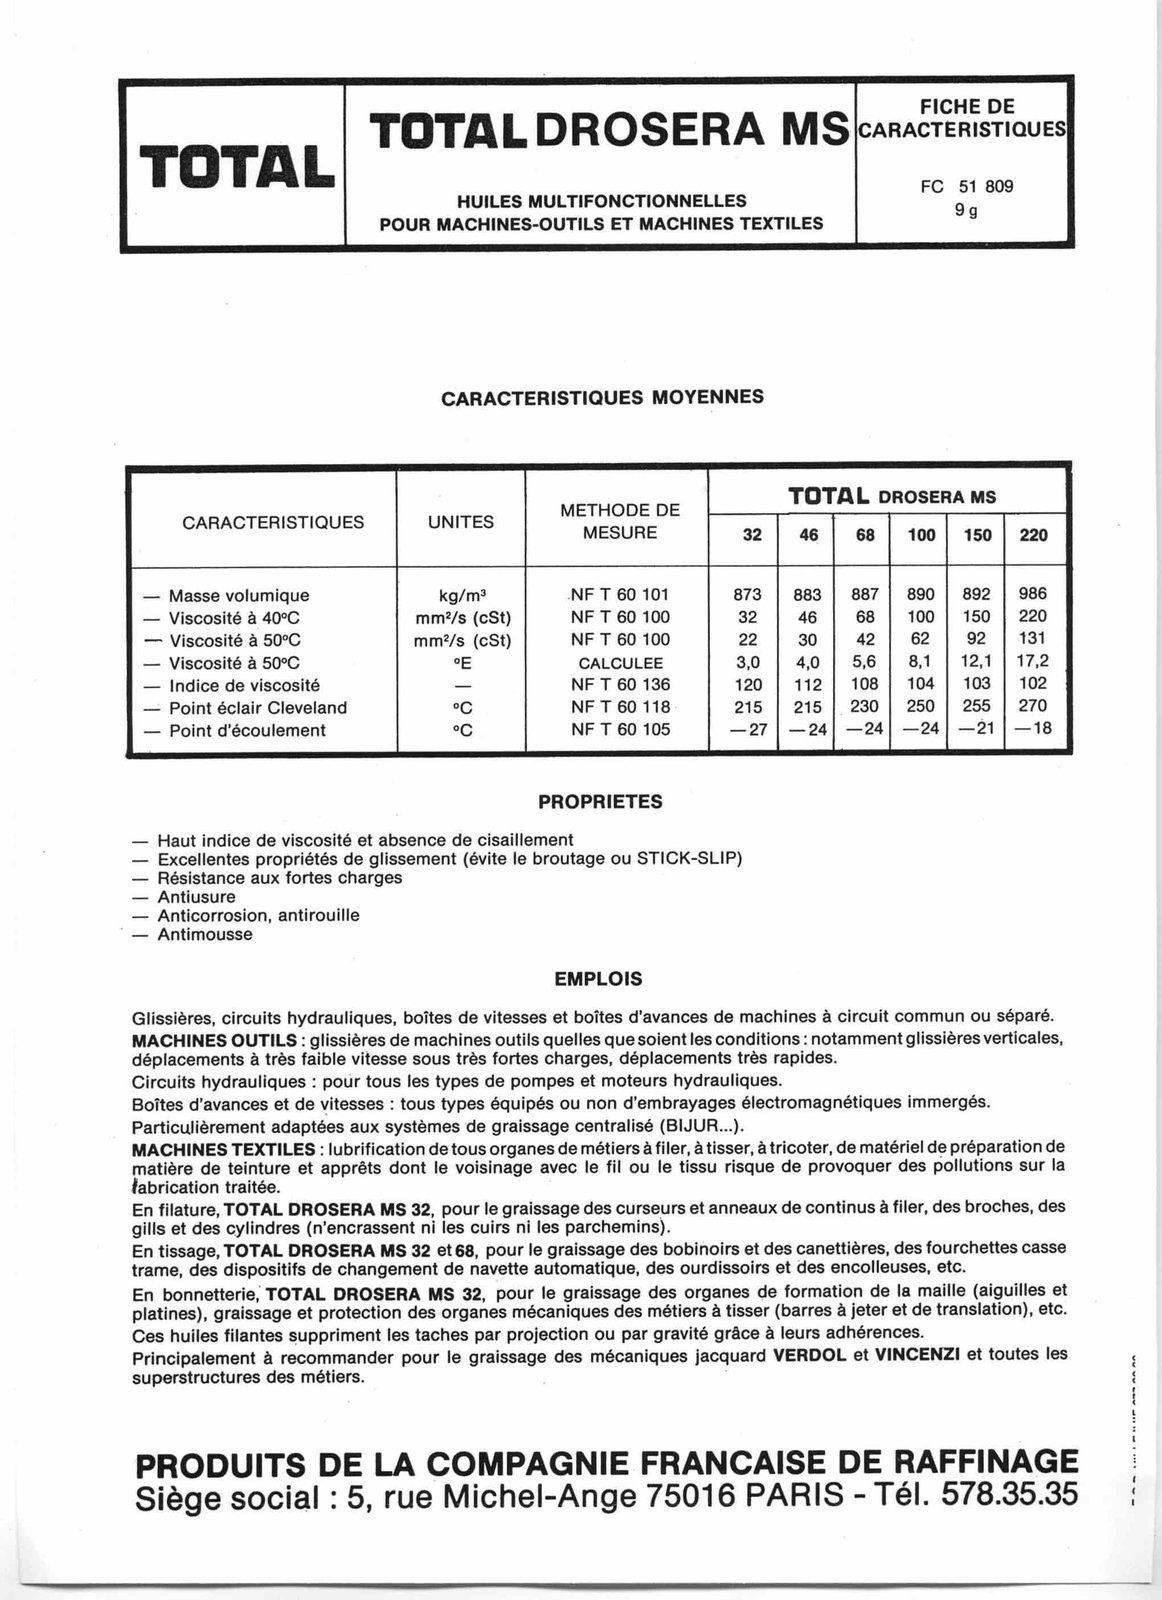 drosera-ms.jpg